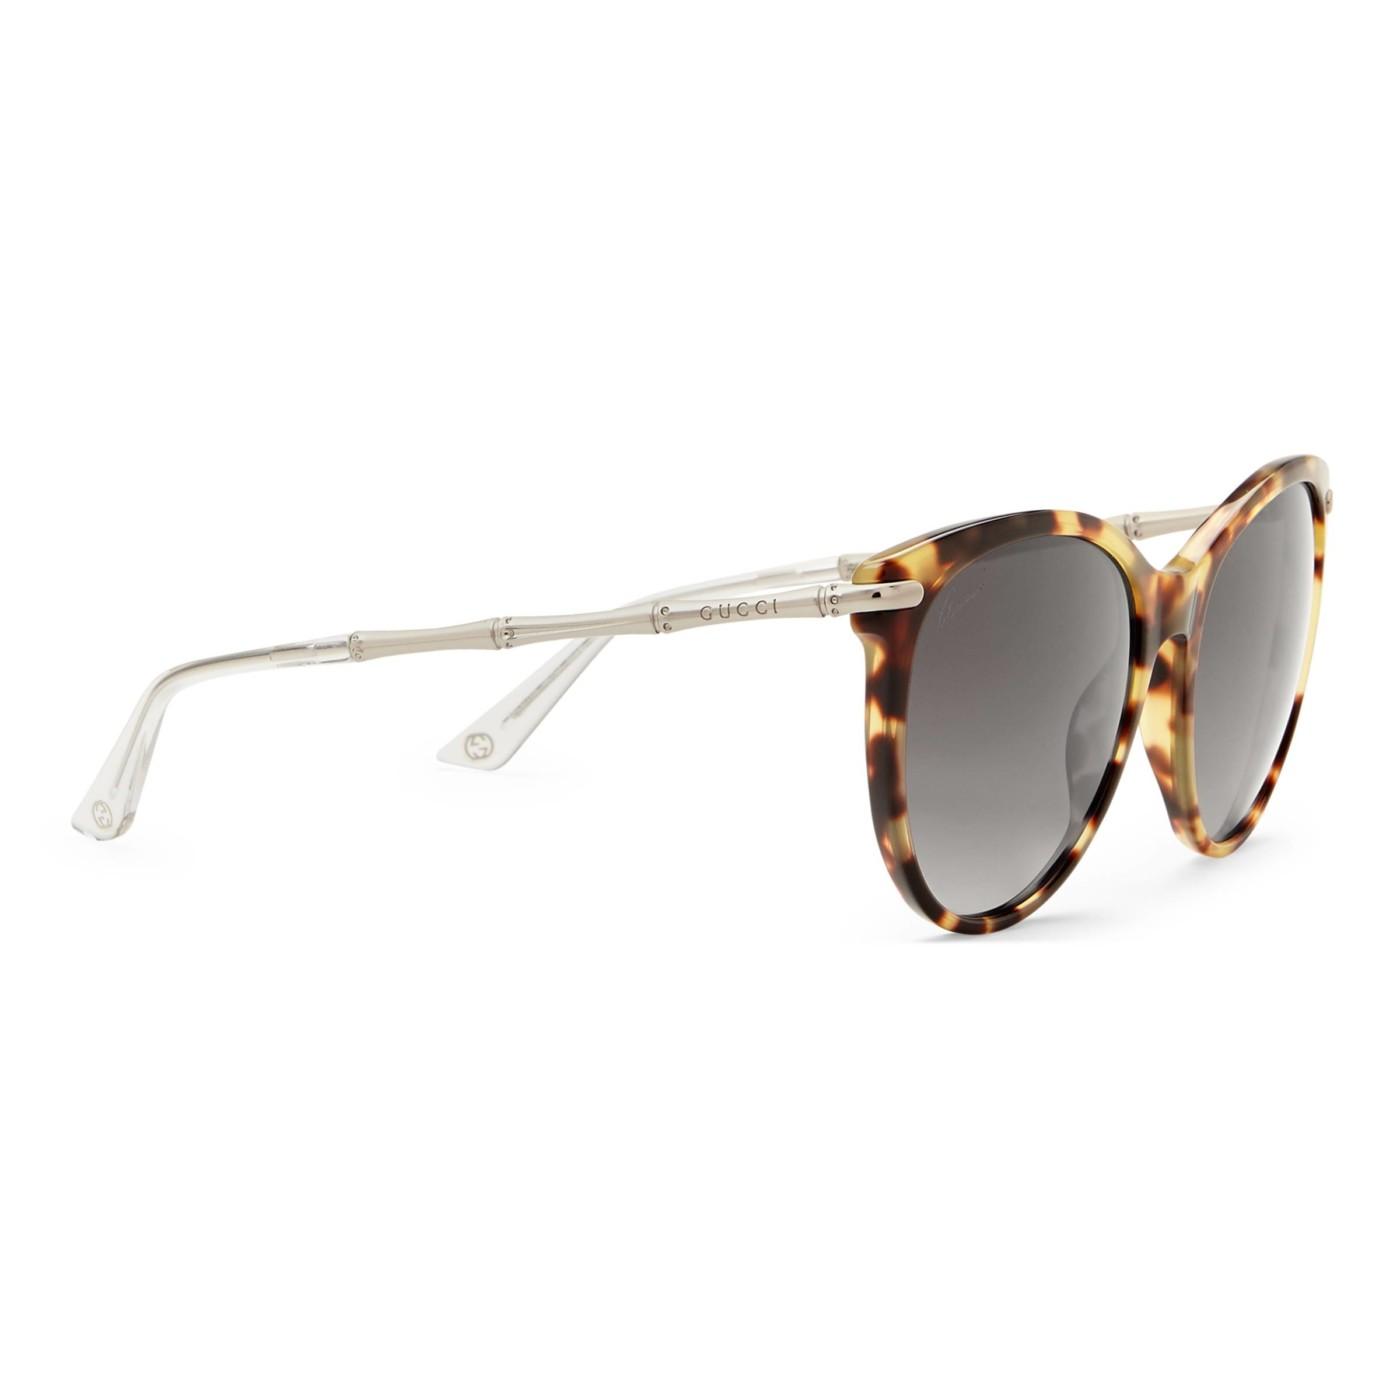 b75c1102d5 Gucci Women s Yellow Havana GG 3771 S Brown Lens Bamboo Temple Sunglasses